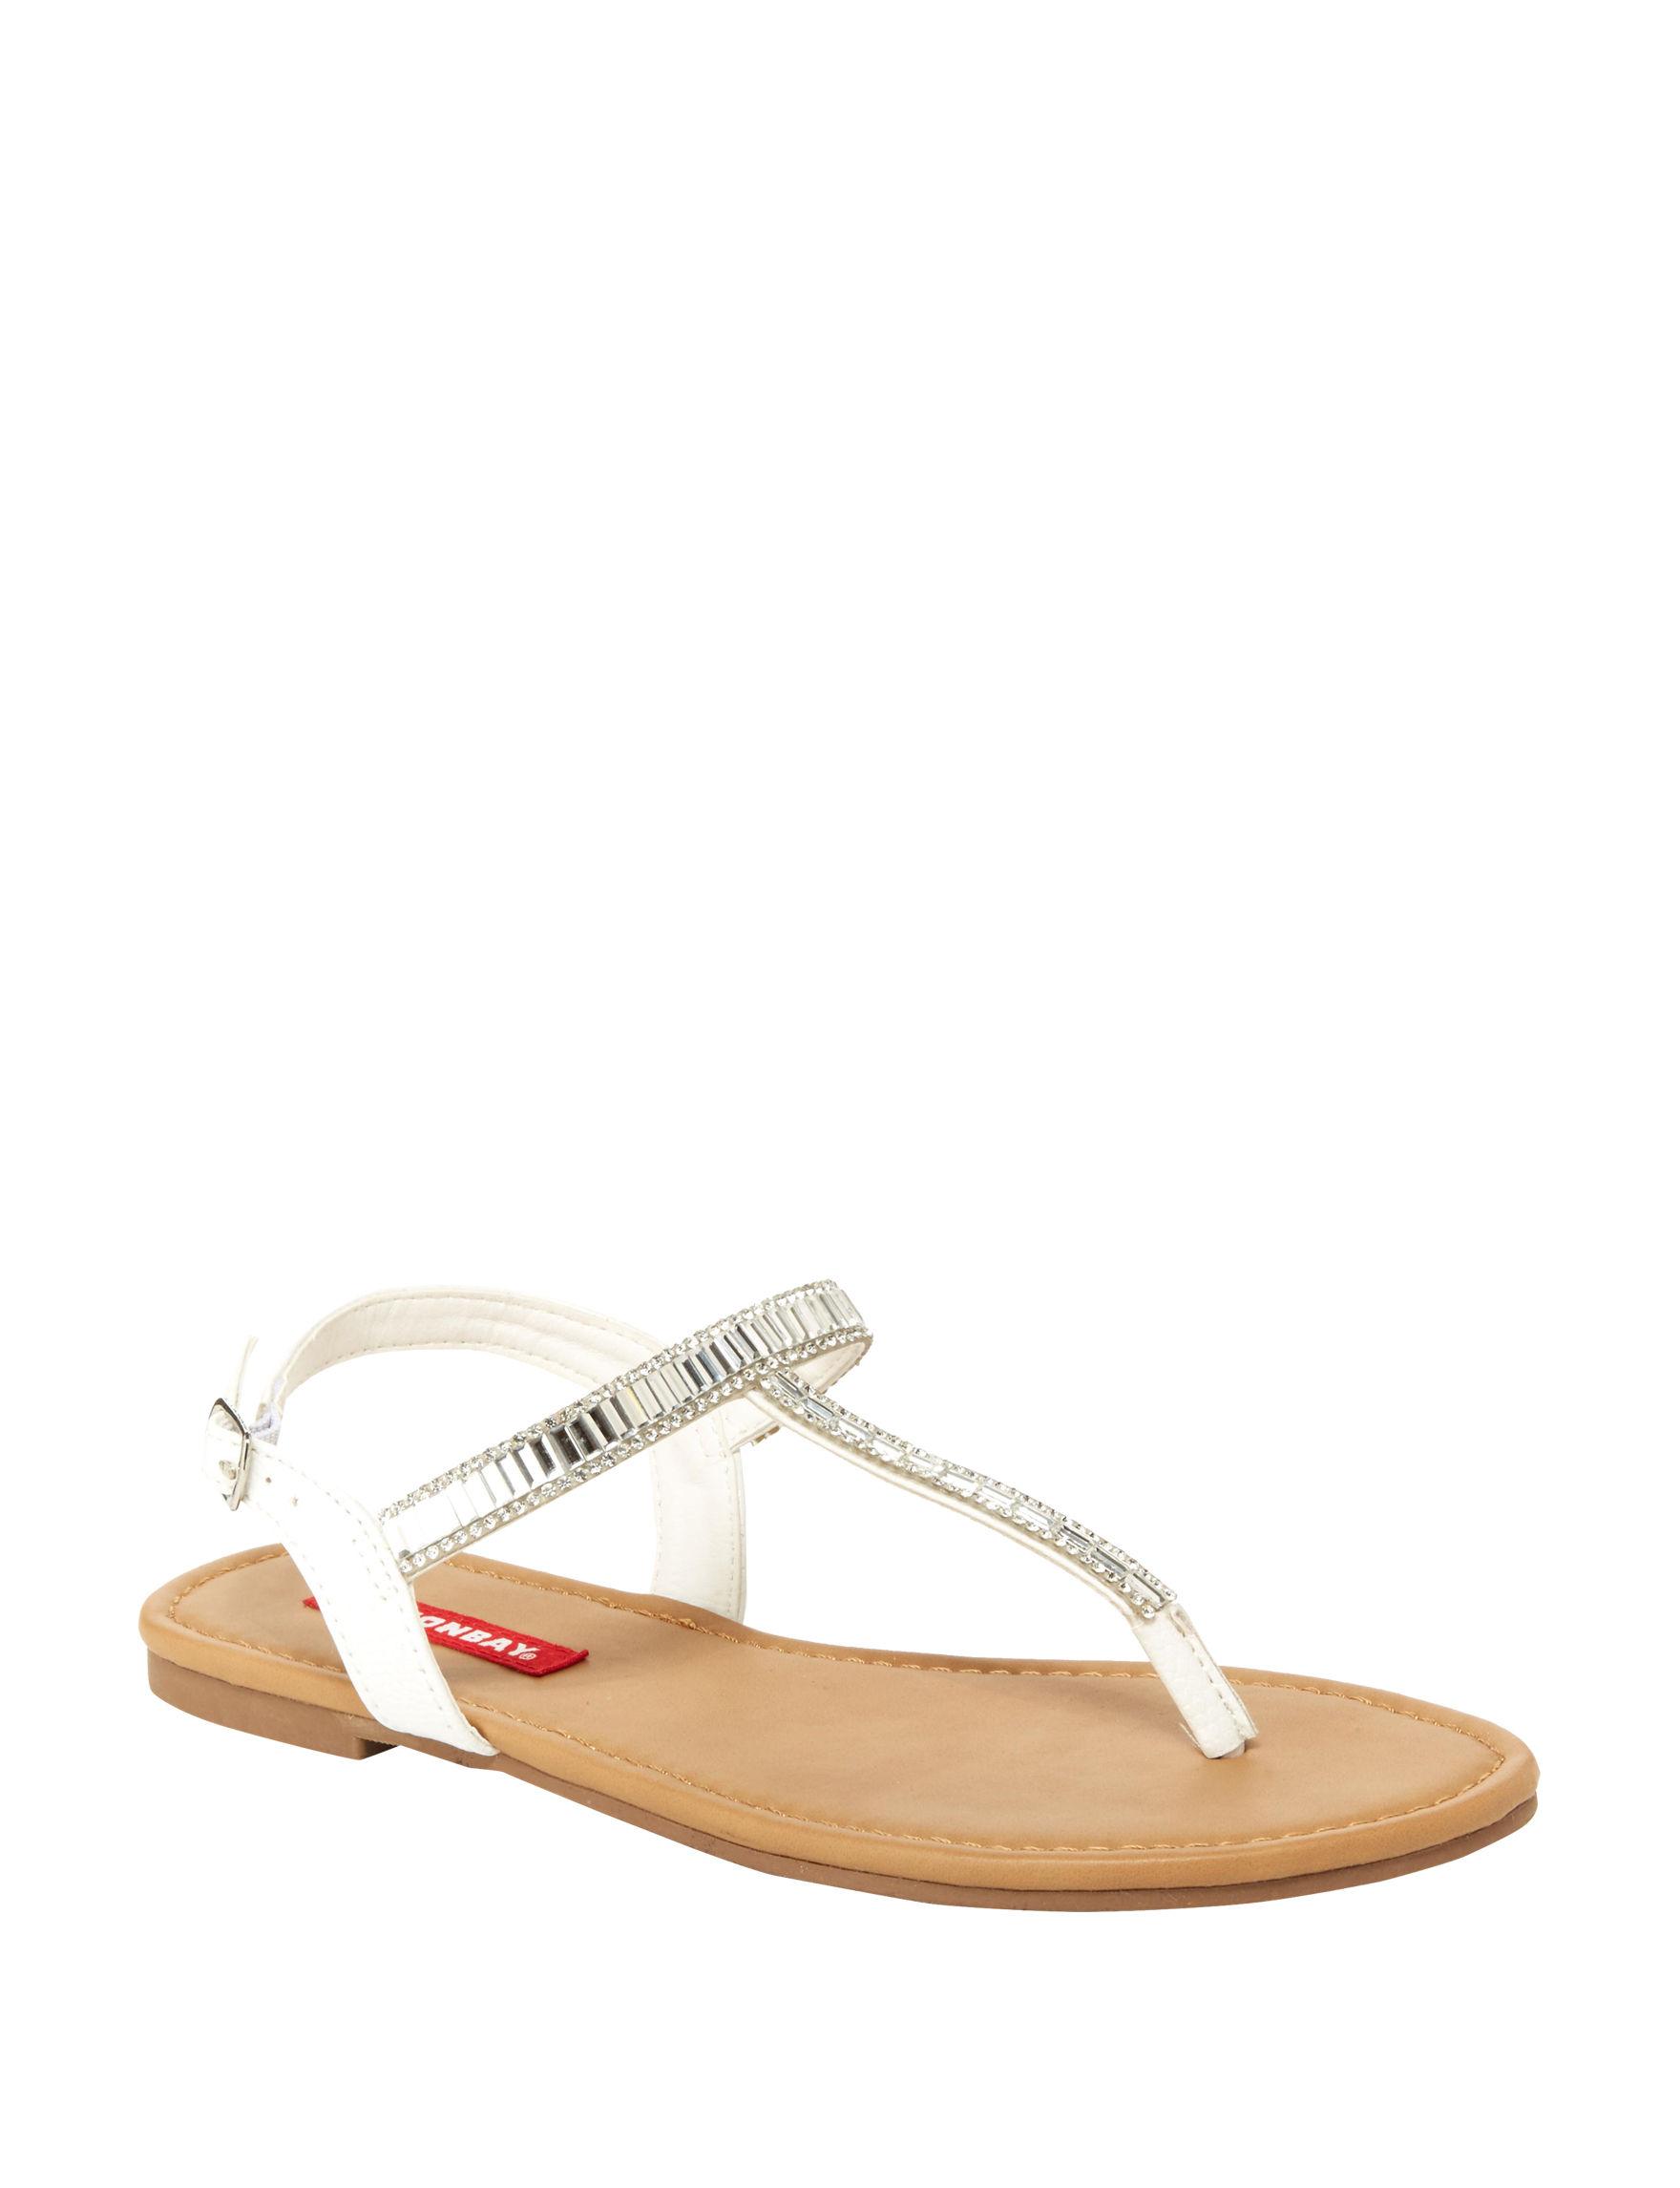 Union Bay White Flat Sandals